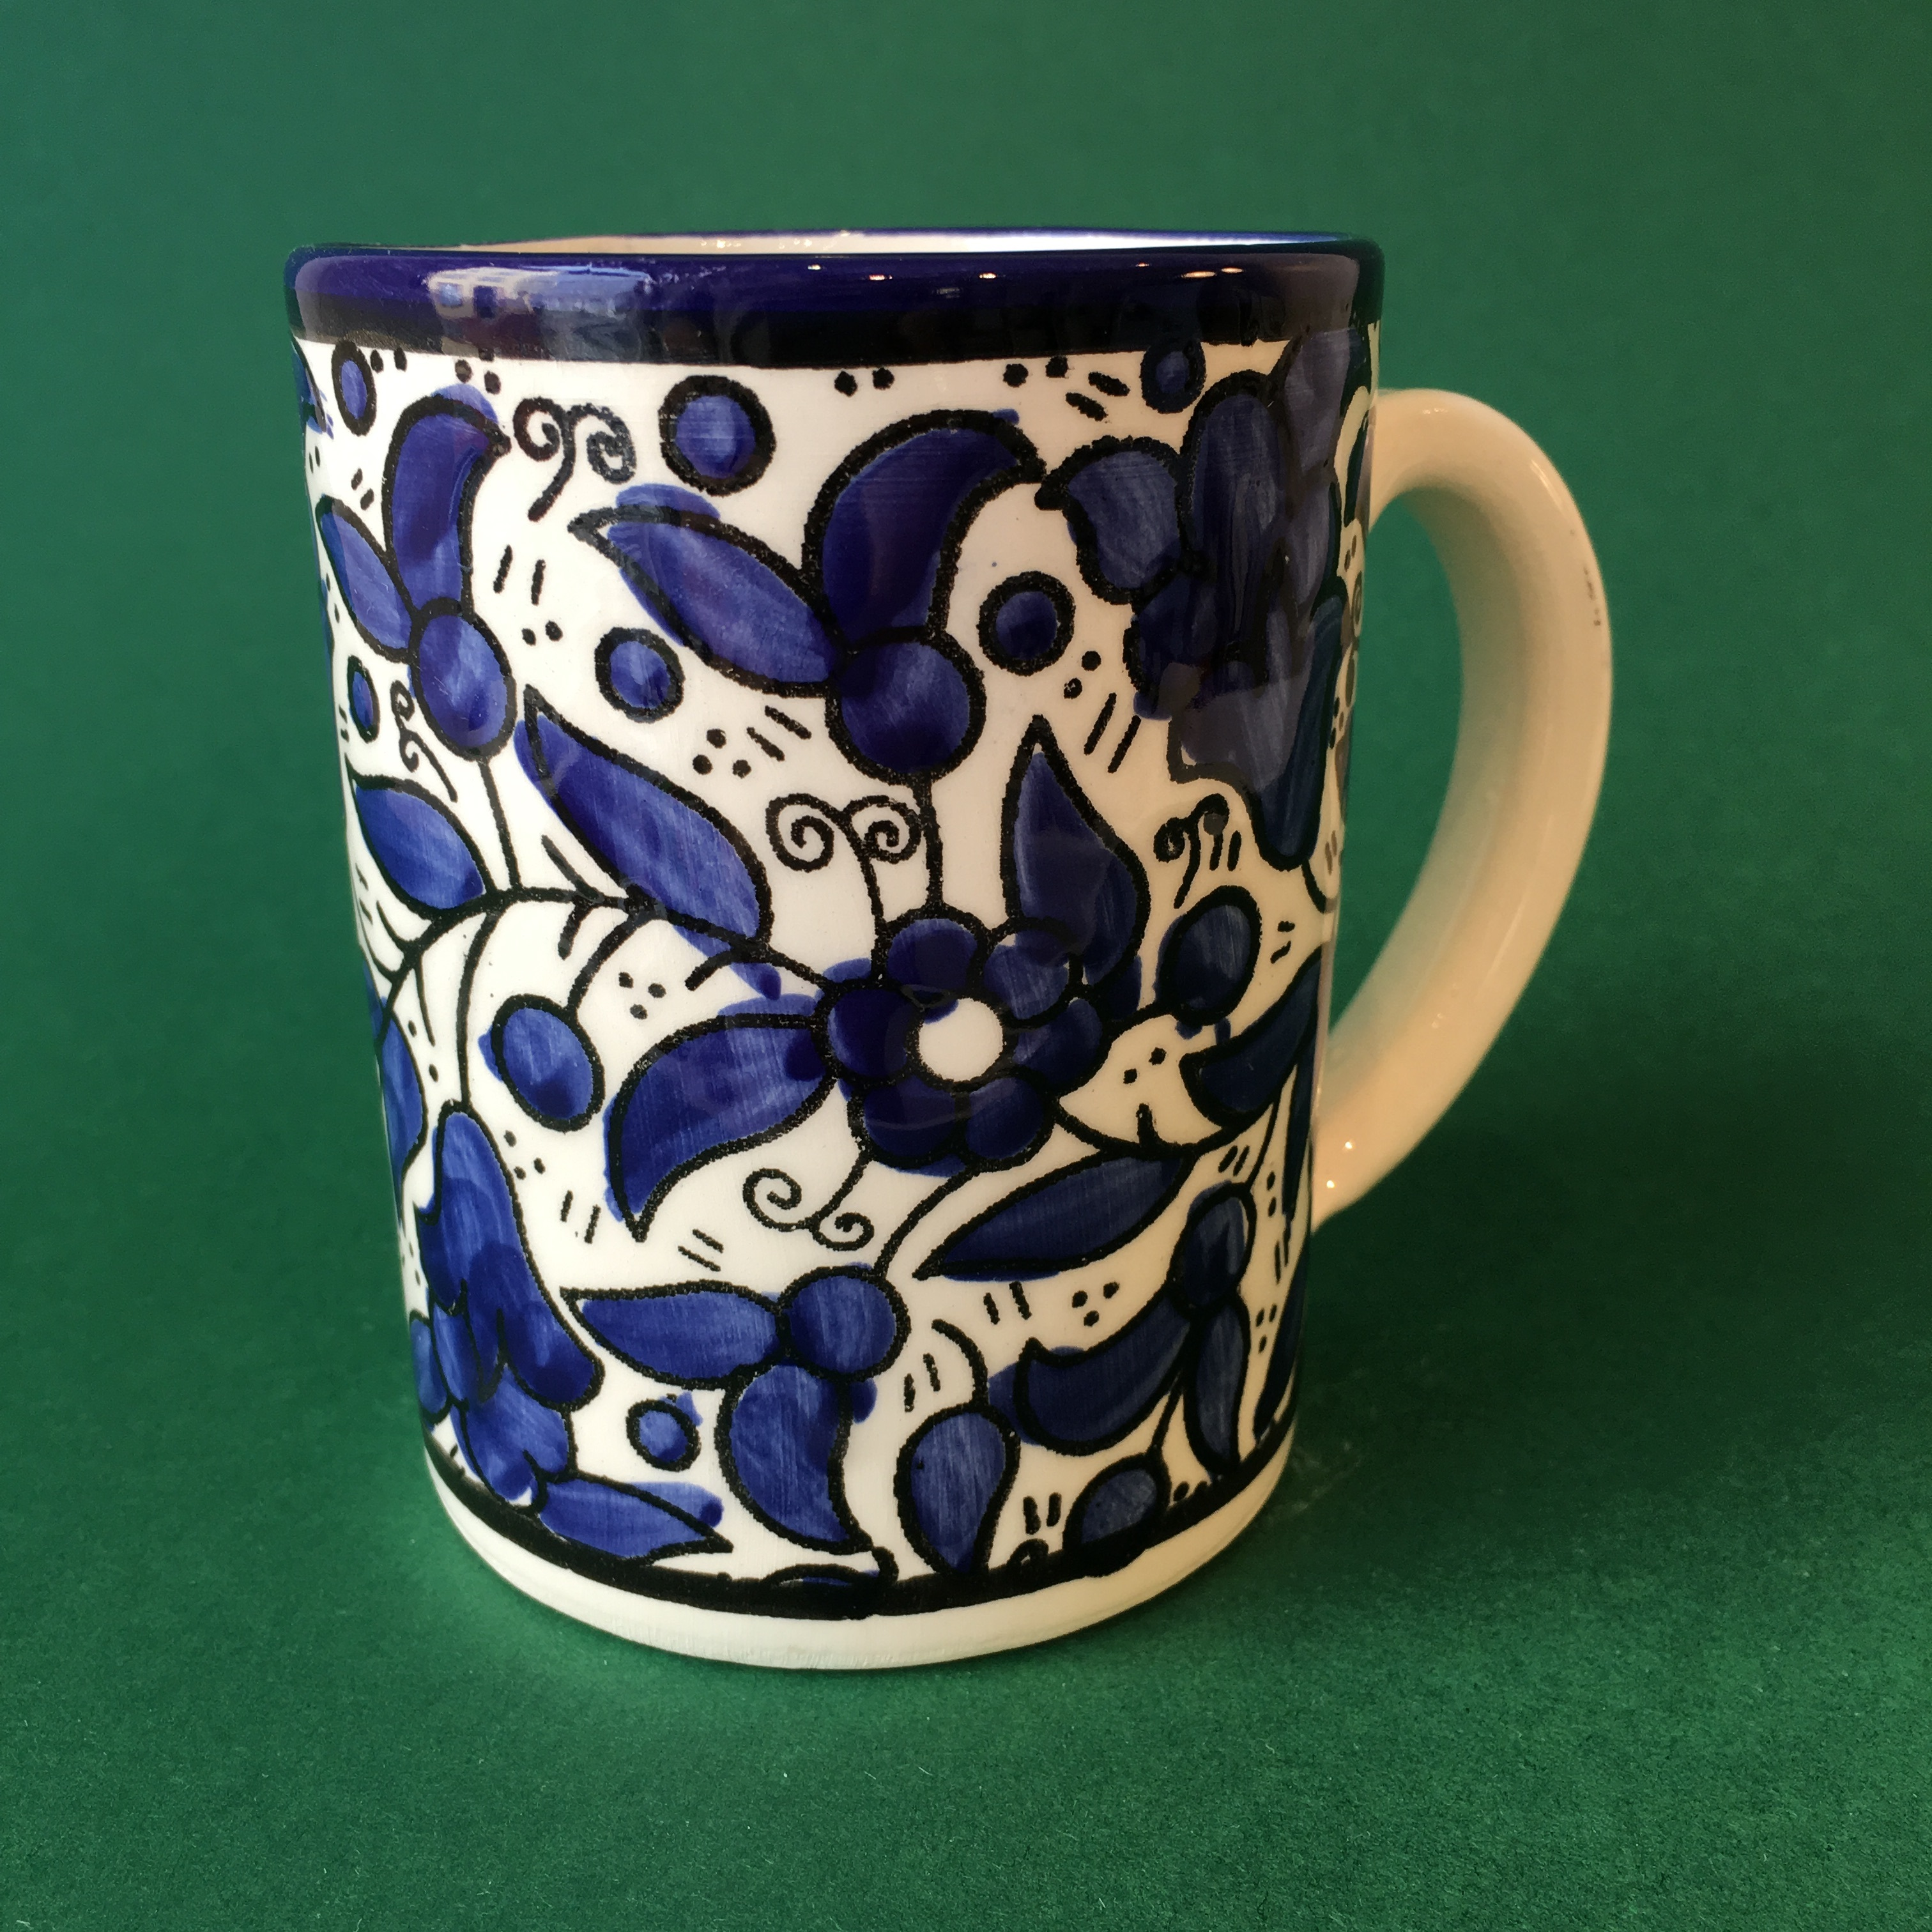 Stor keramikkopp, blå (stort mønster)